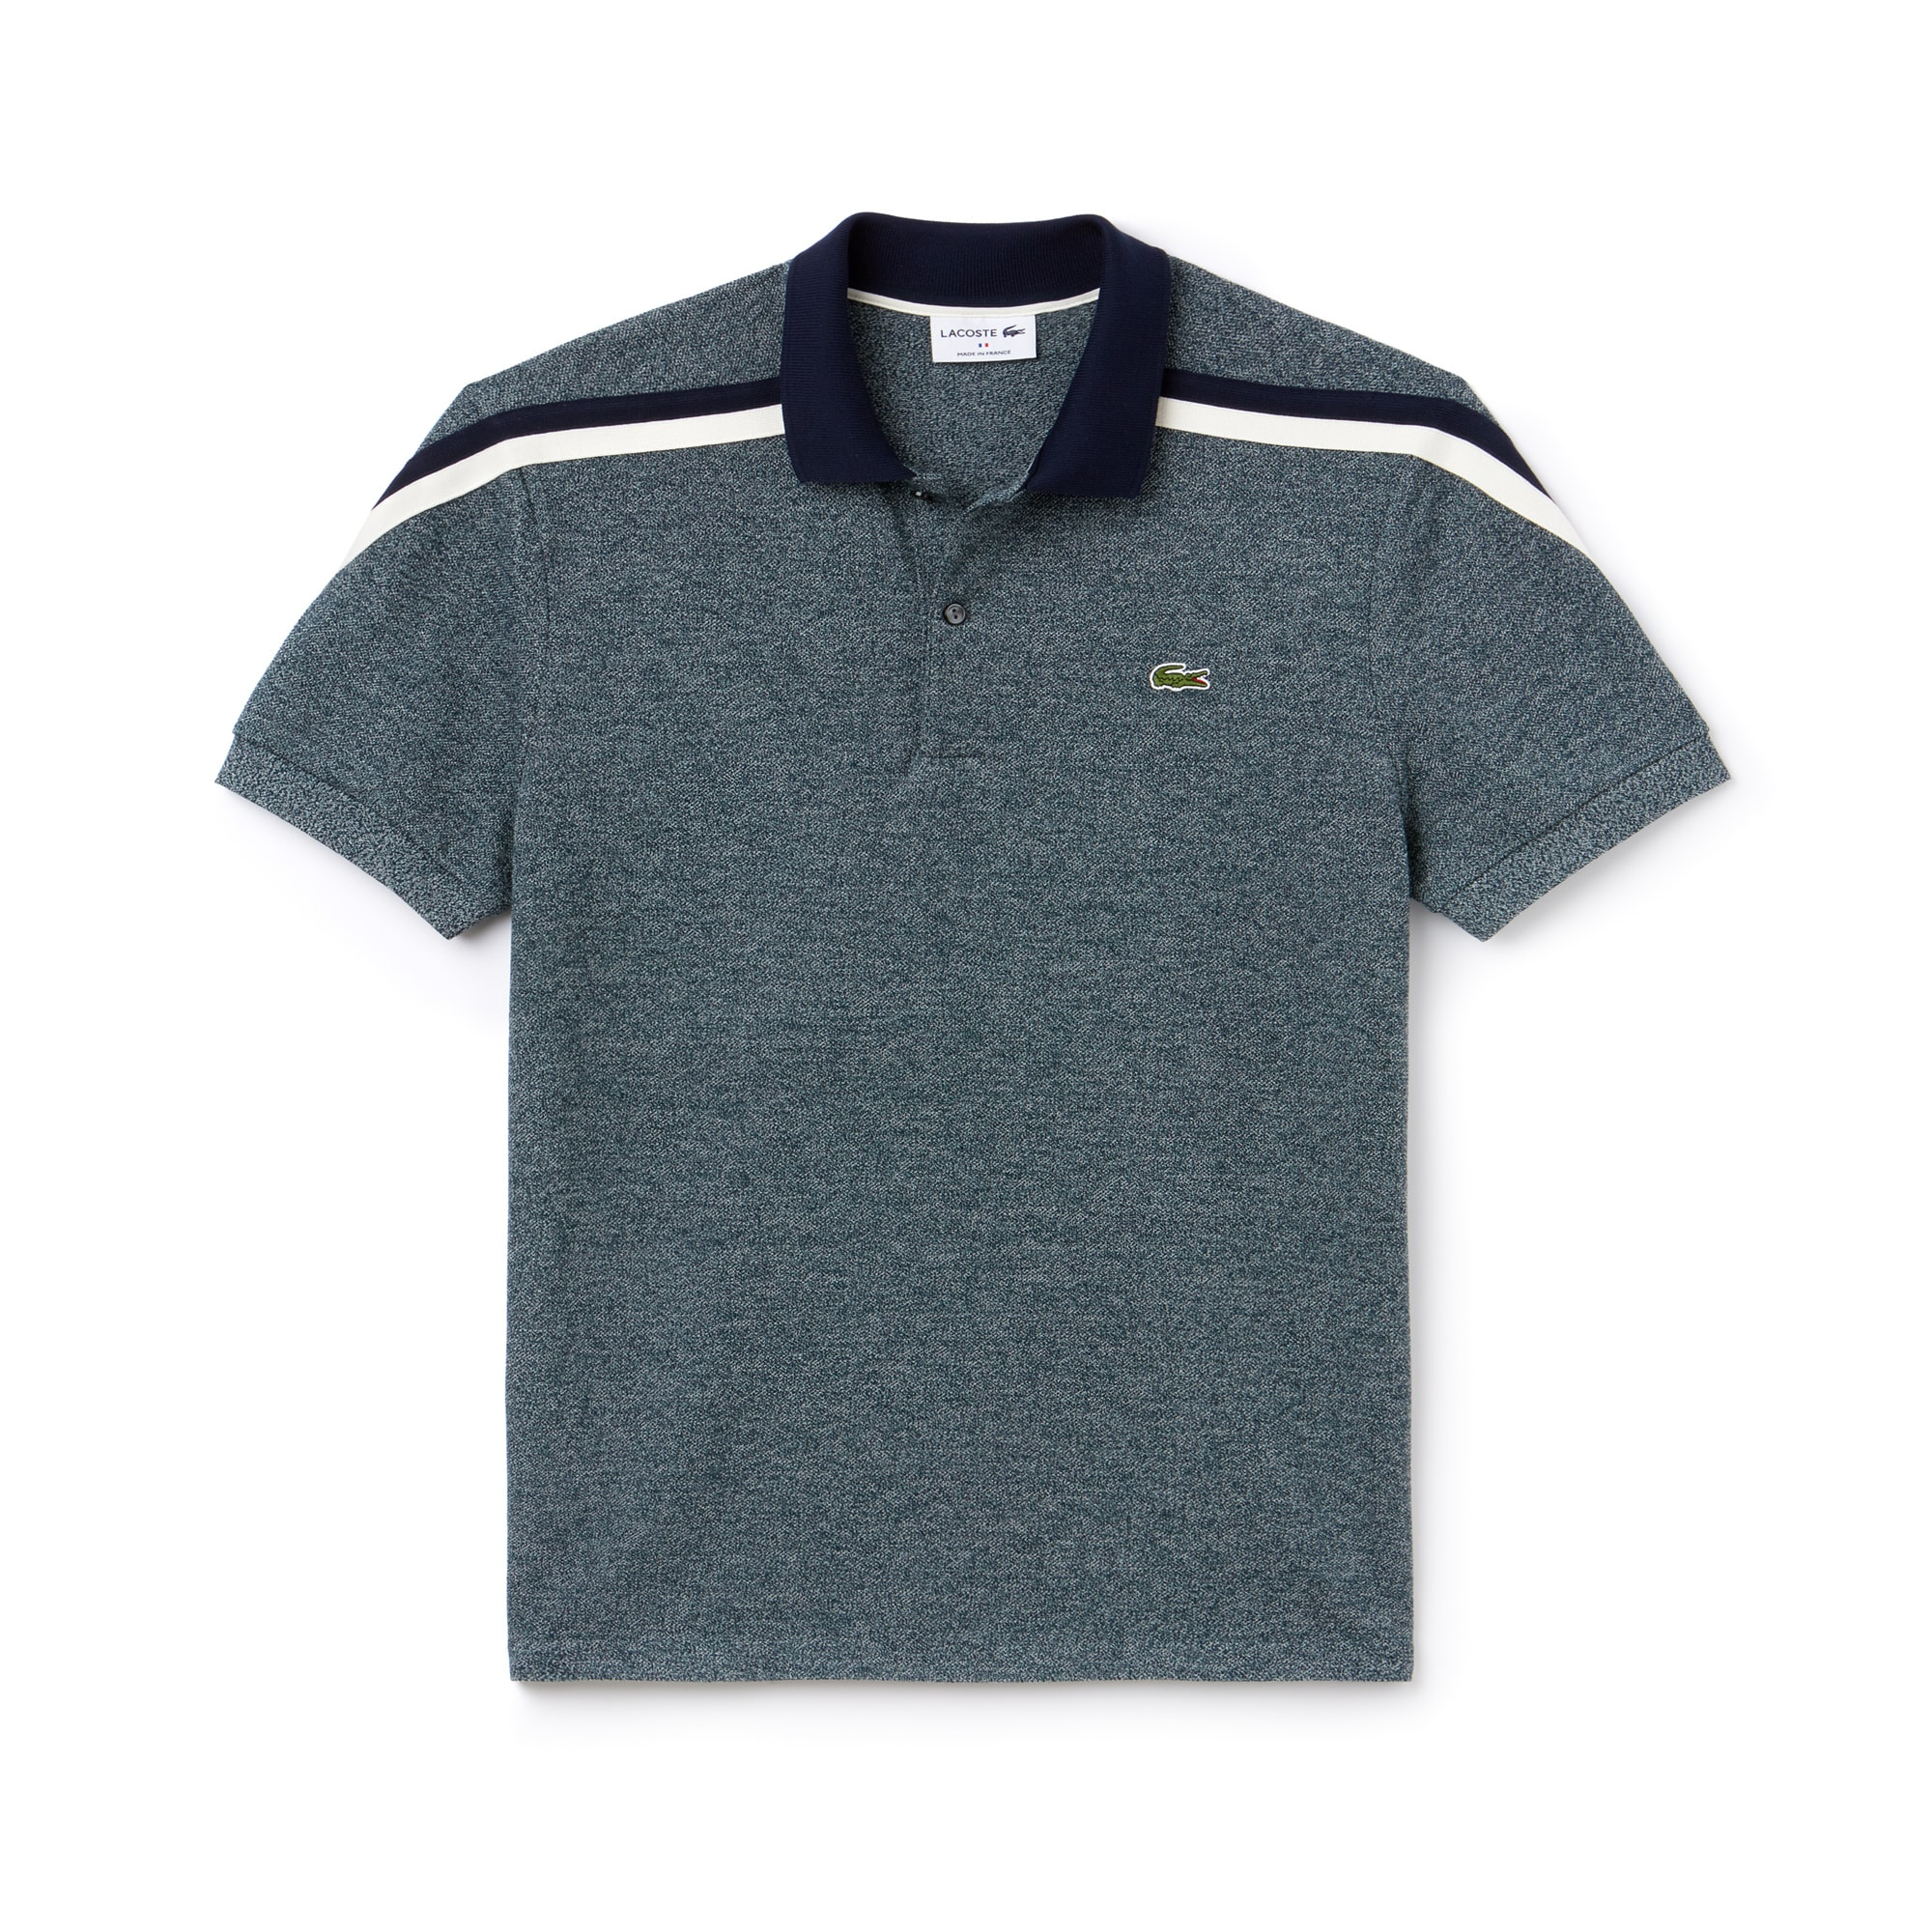 Lacoste - LACOSTE Made In France Regular Fit Herren-Poloshirt aus Baumwoll-Piqué - 3